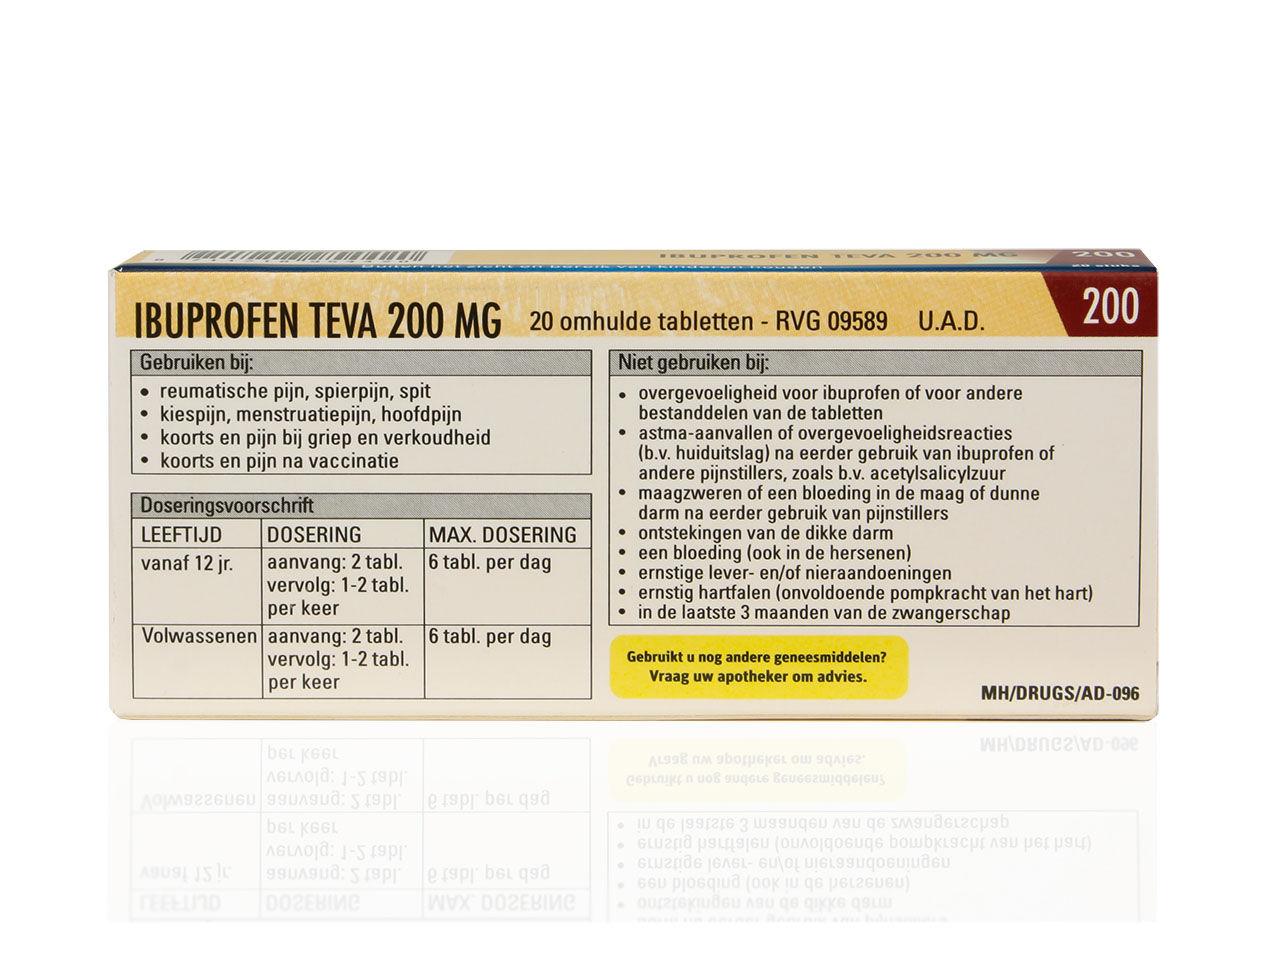 Ibuprofen Teva Tablet 200mg